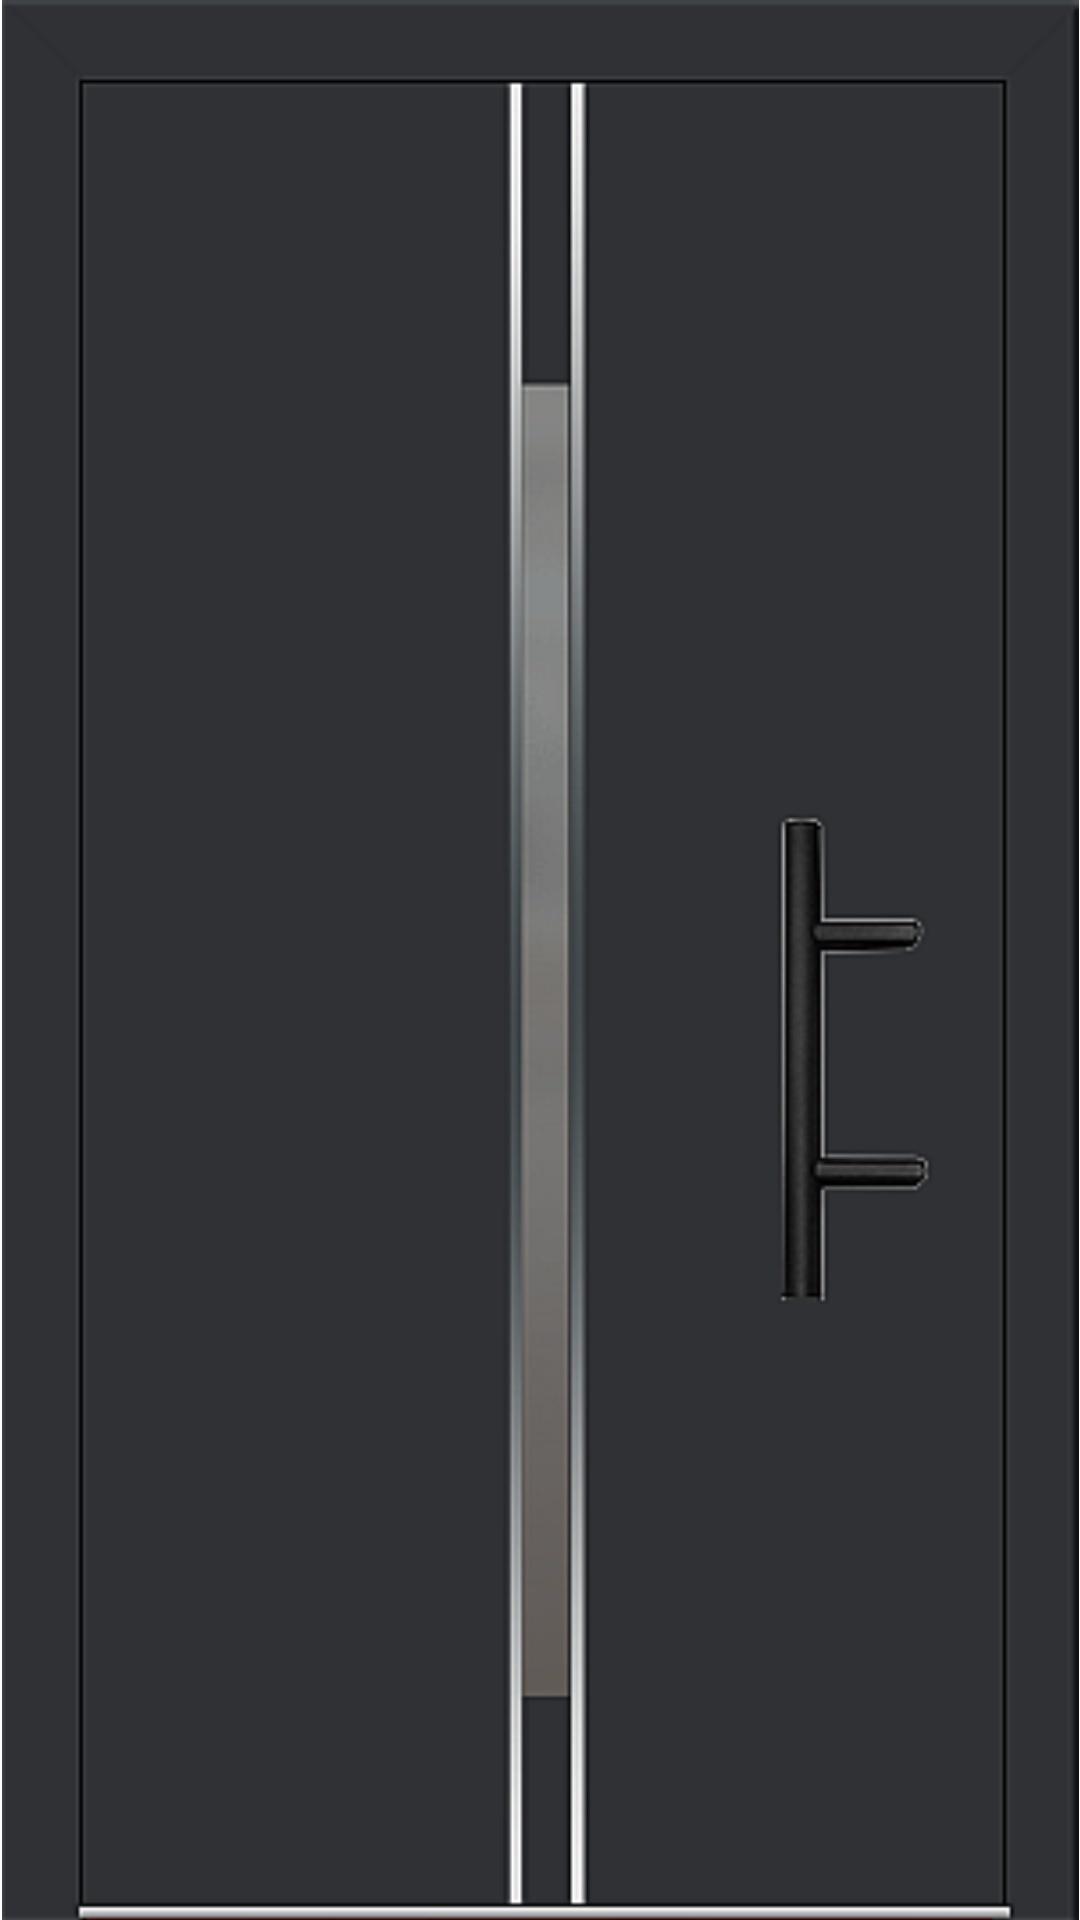 Holz-Alu Haustür Modell 66864 schwarz